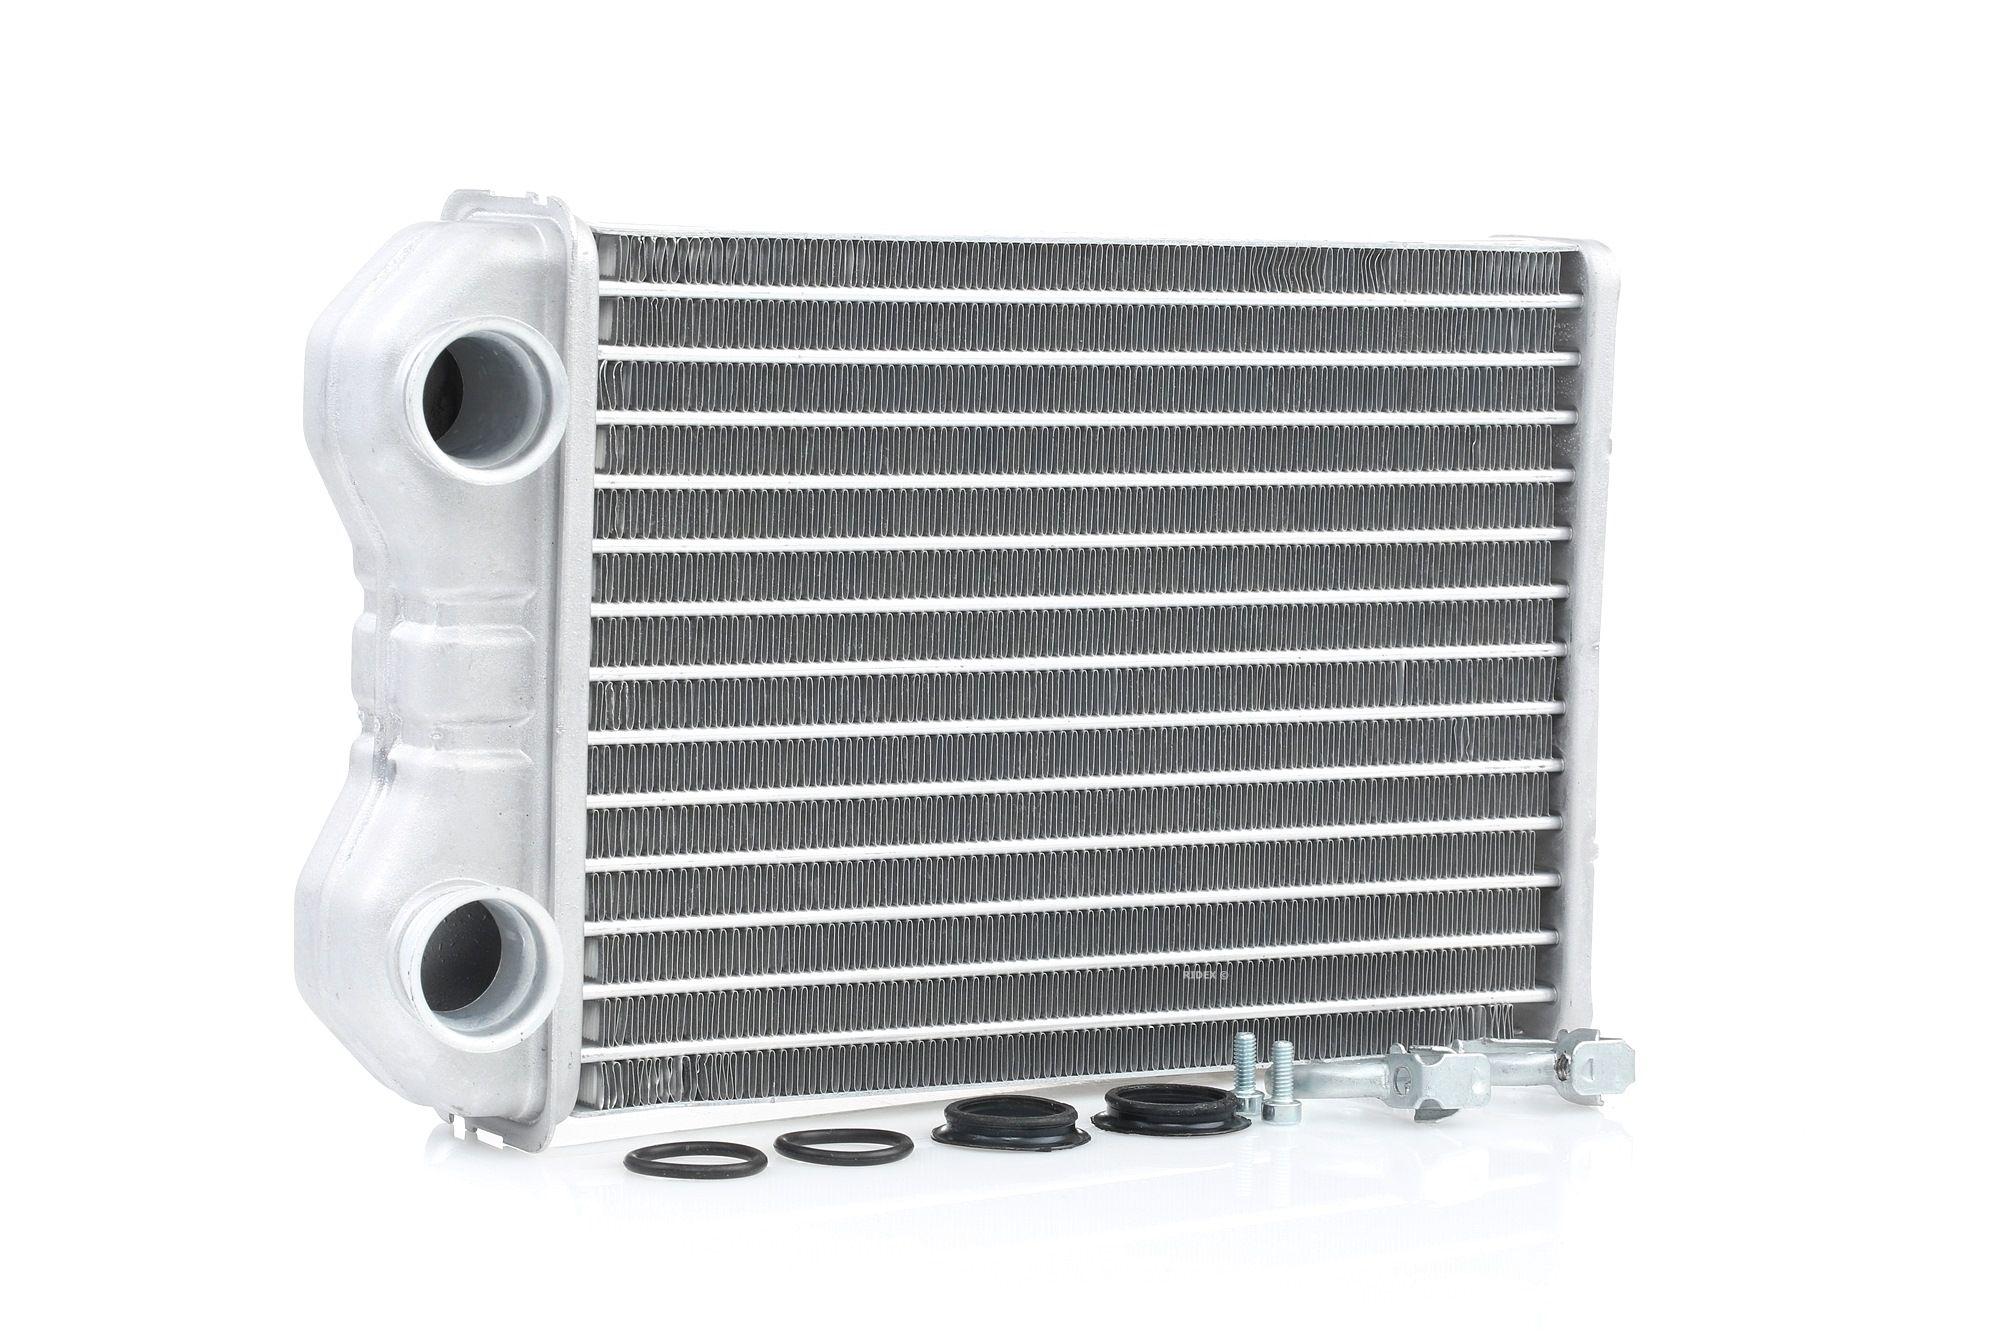 Radiatore riscaldamento 467H0082 acquista online 24/7